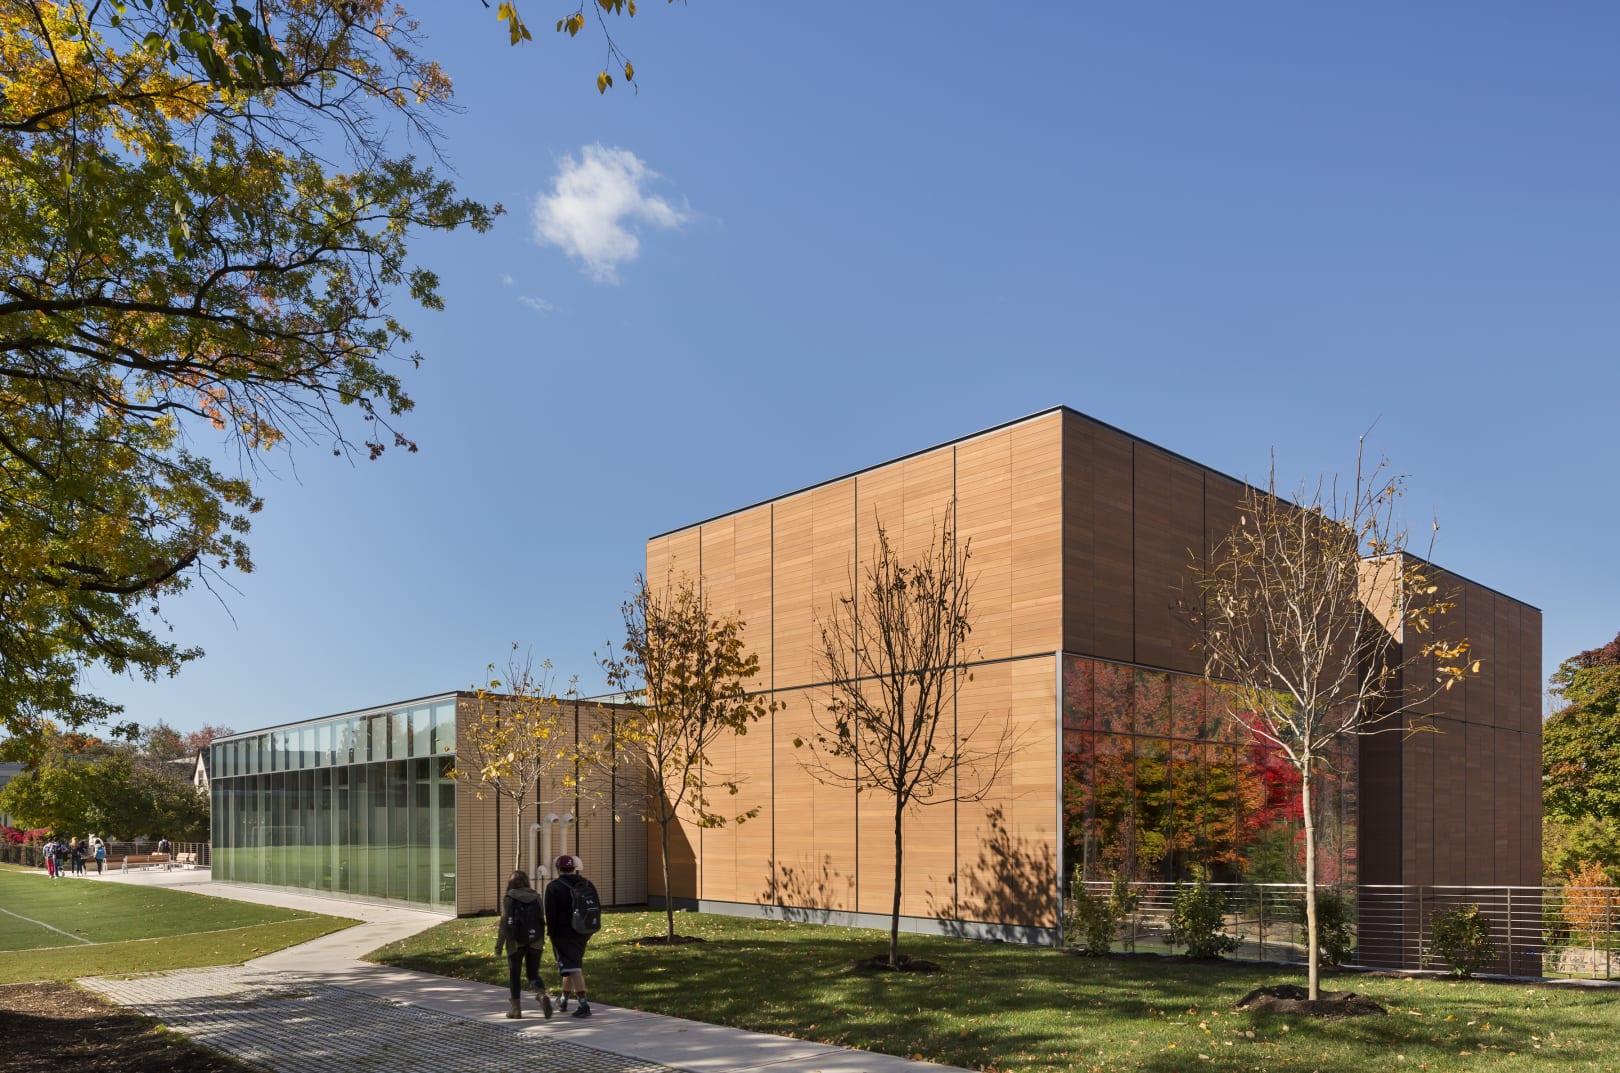 Dwight-Englewood School Hajjar STEM Center